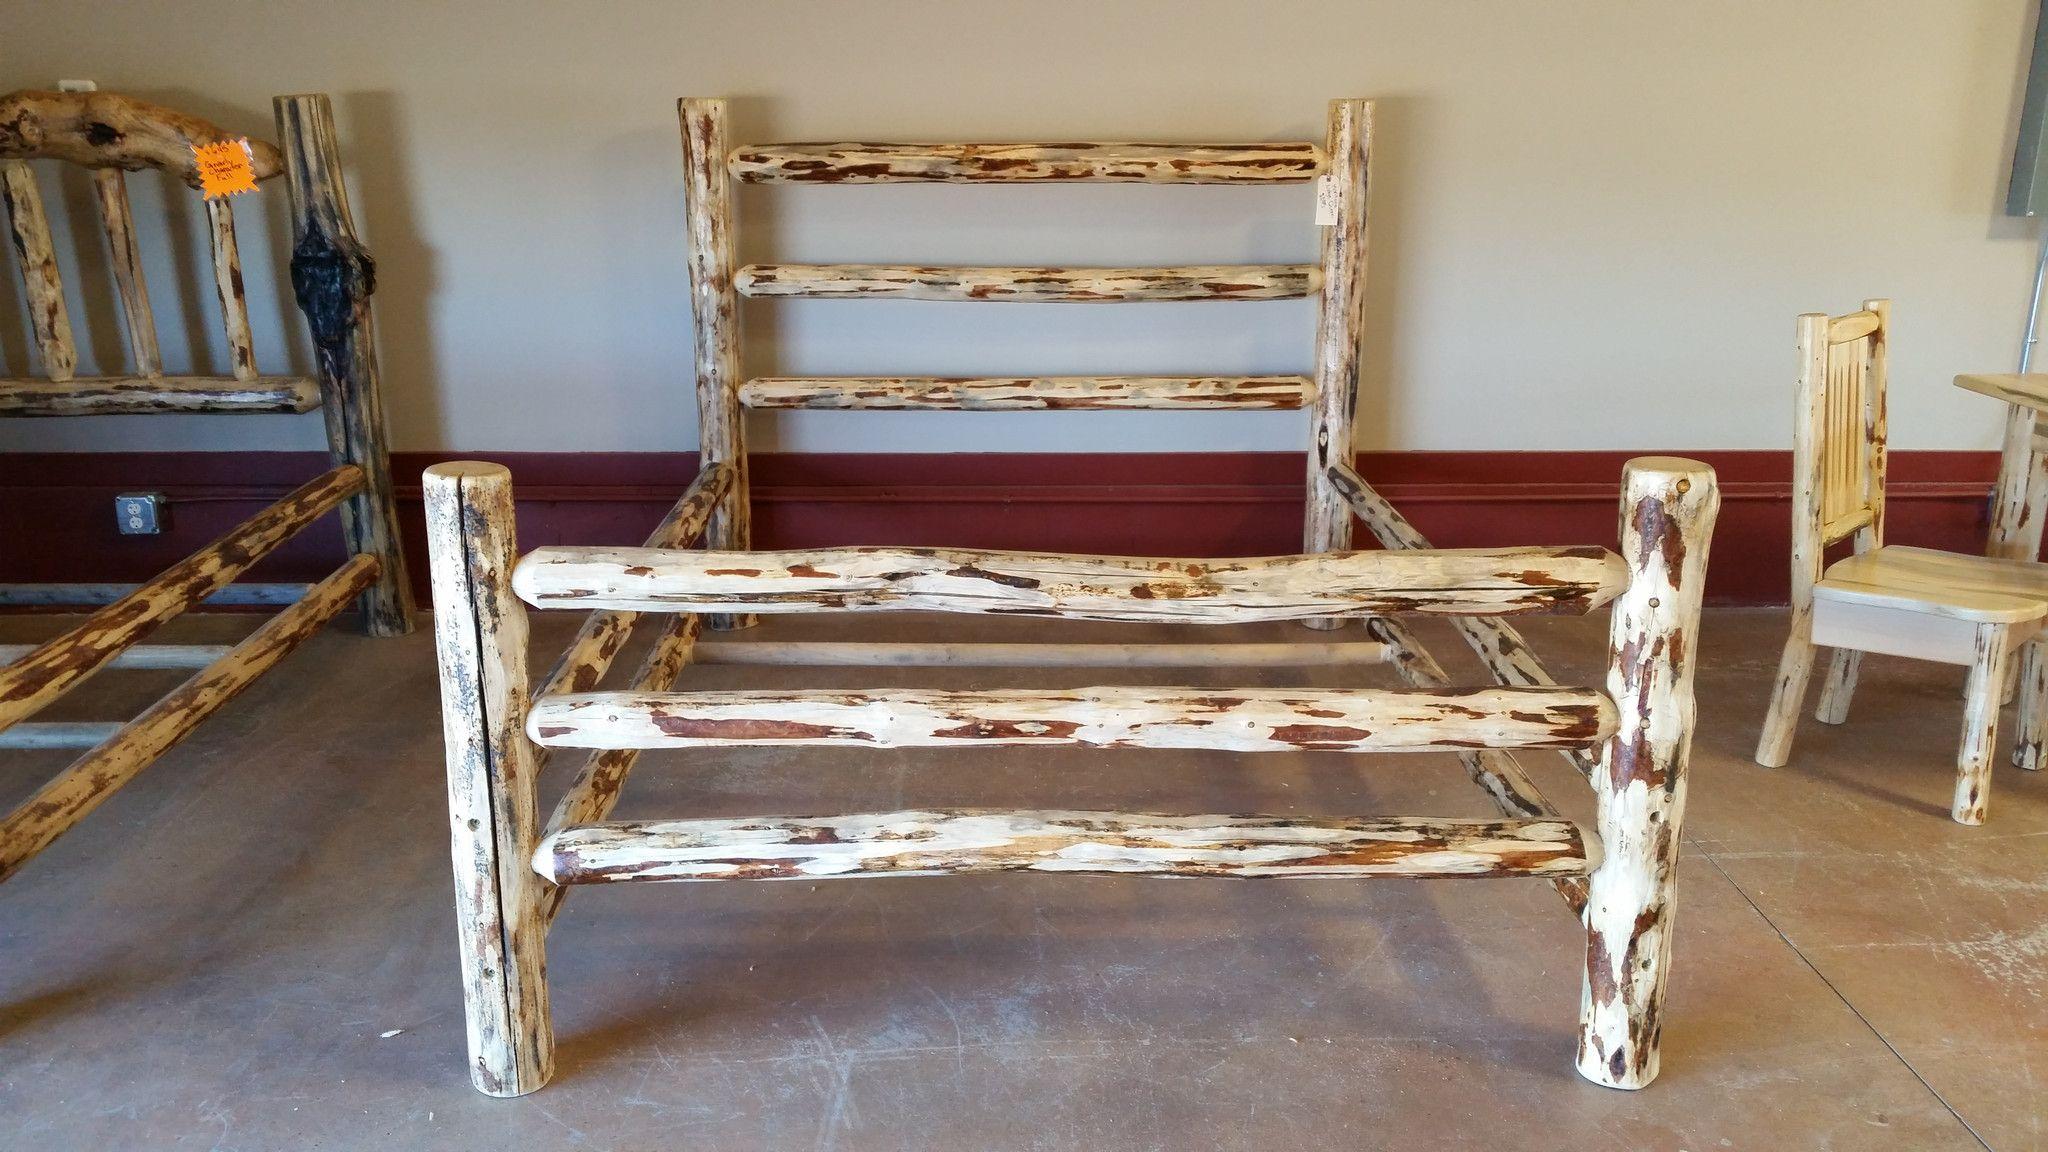 Attirant Log Bed Log Furniture Rustic Furniture Montana Pine Kalispell Glacier Park